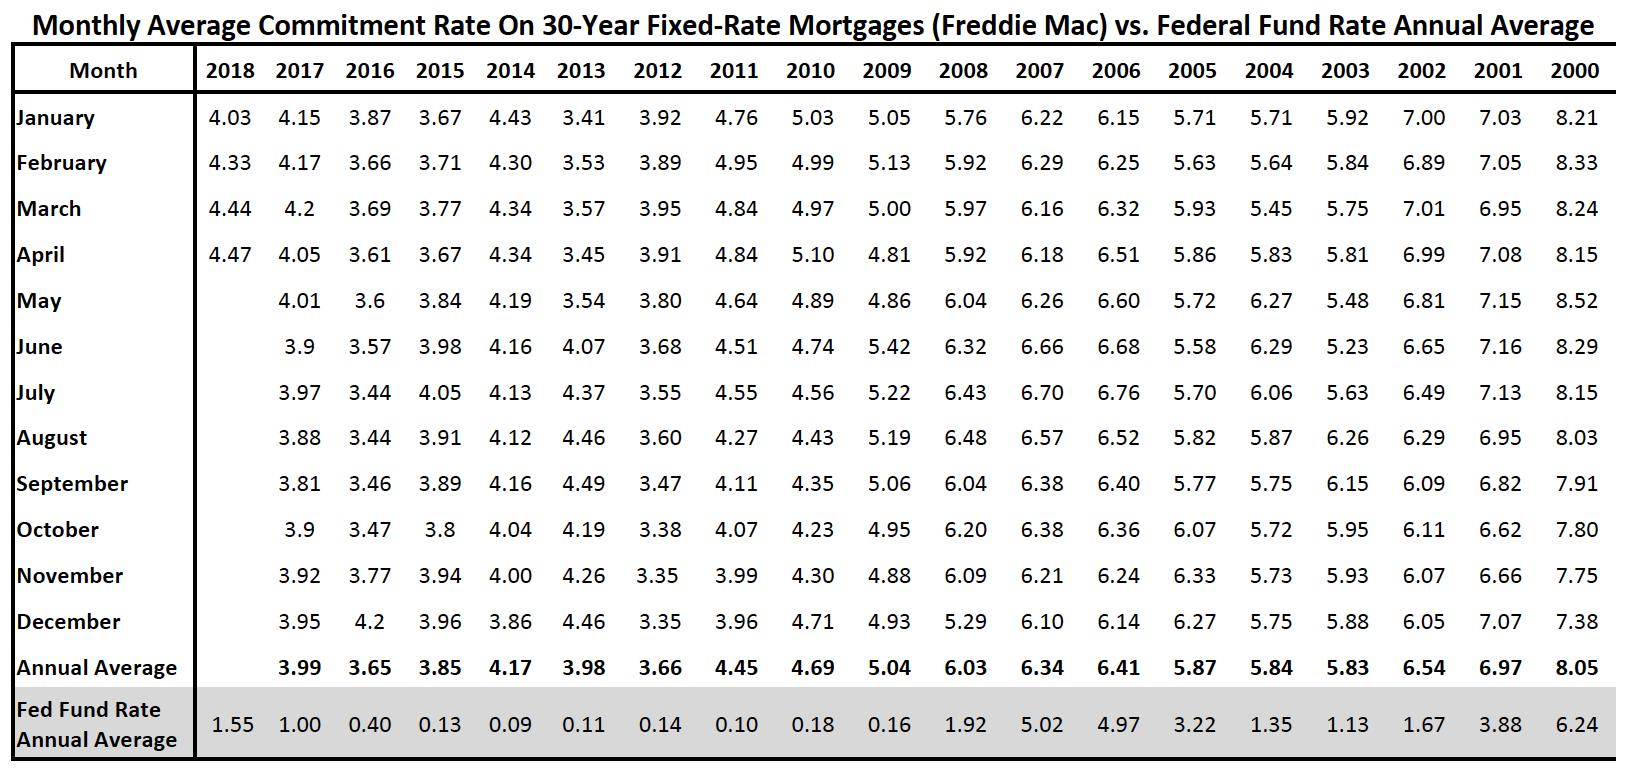 mortgagechart.png